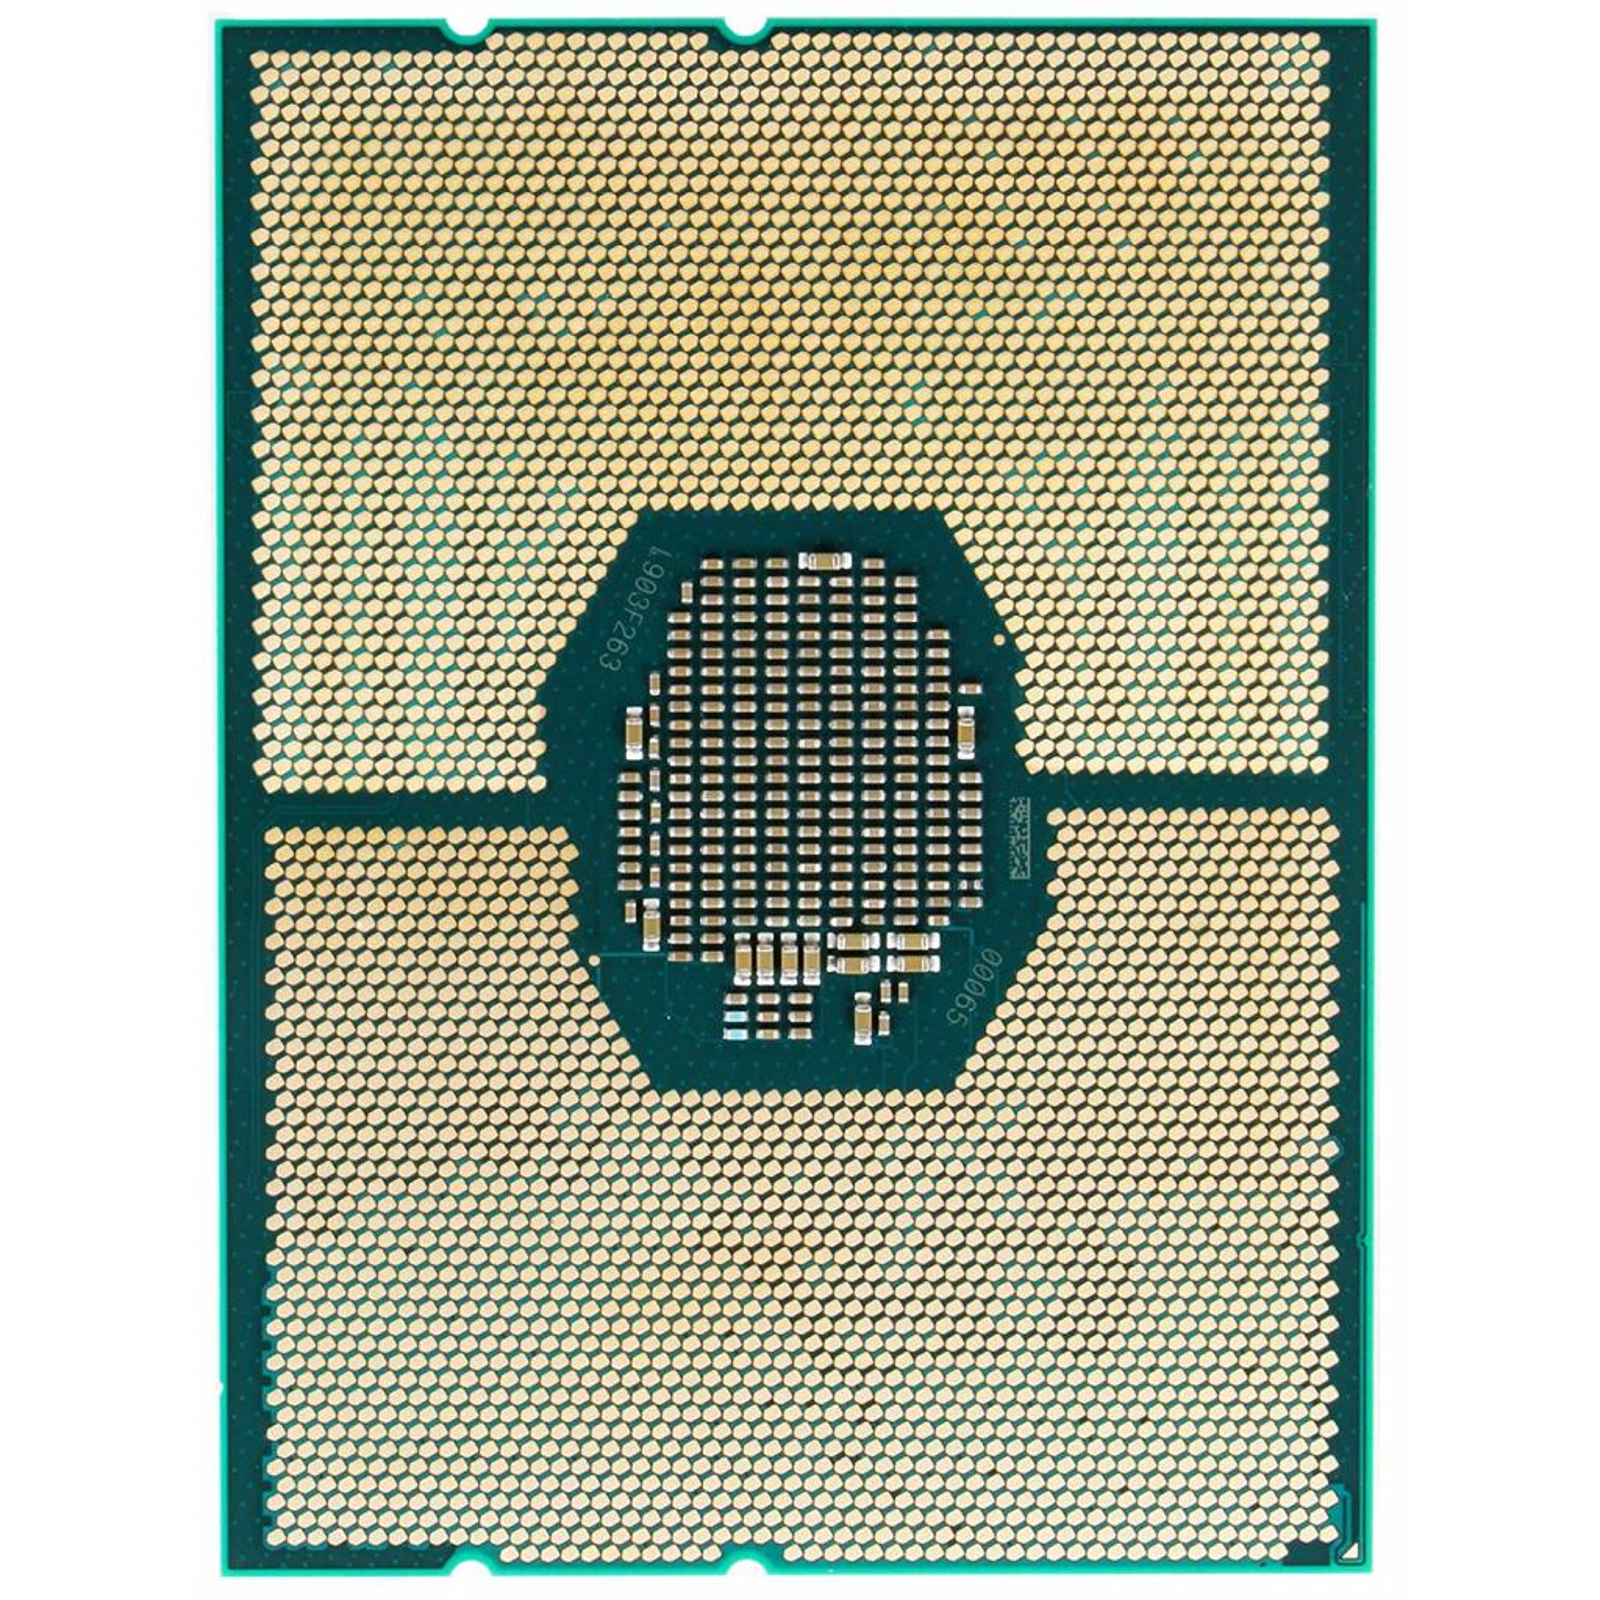 Процессор серверный INTEL Xeon Silver 4114 10C/20T/2.20 GHz/13.75MB/FCLGA3647 Tray (CD8067303561800) изображение 2